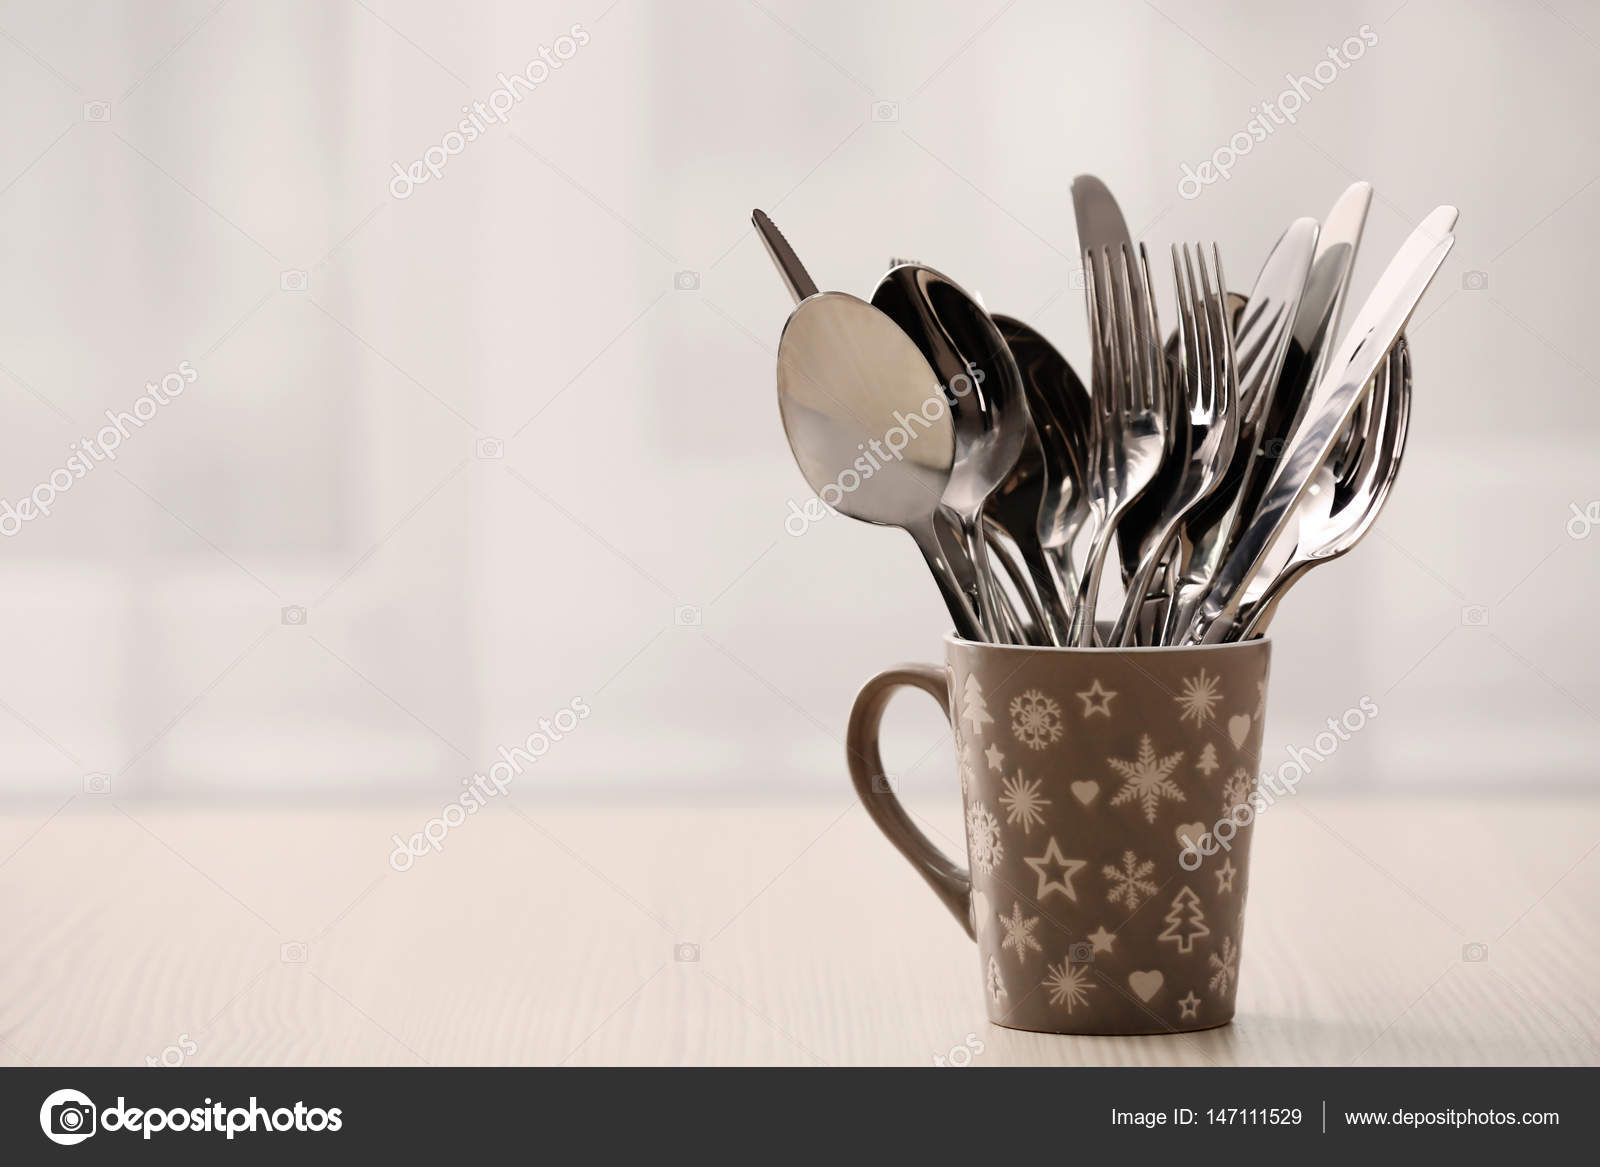 metal kitchen tables makeover ideas 一套金属厨房用具 图库照片 c belchonock 147111529 一套金属厨房用具在陶瓷杯 在桌子上 照片作者belchonock